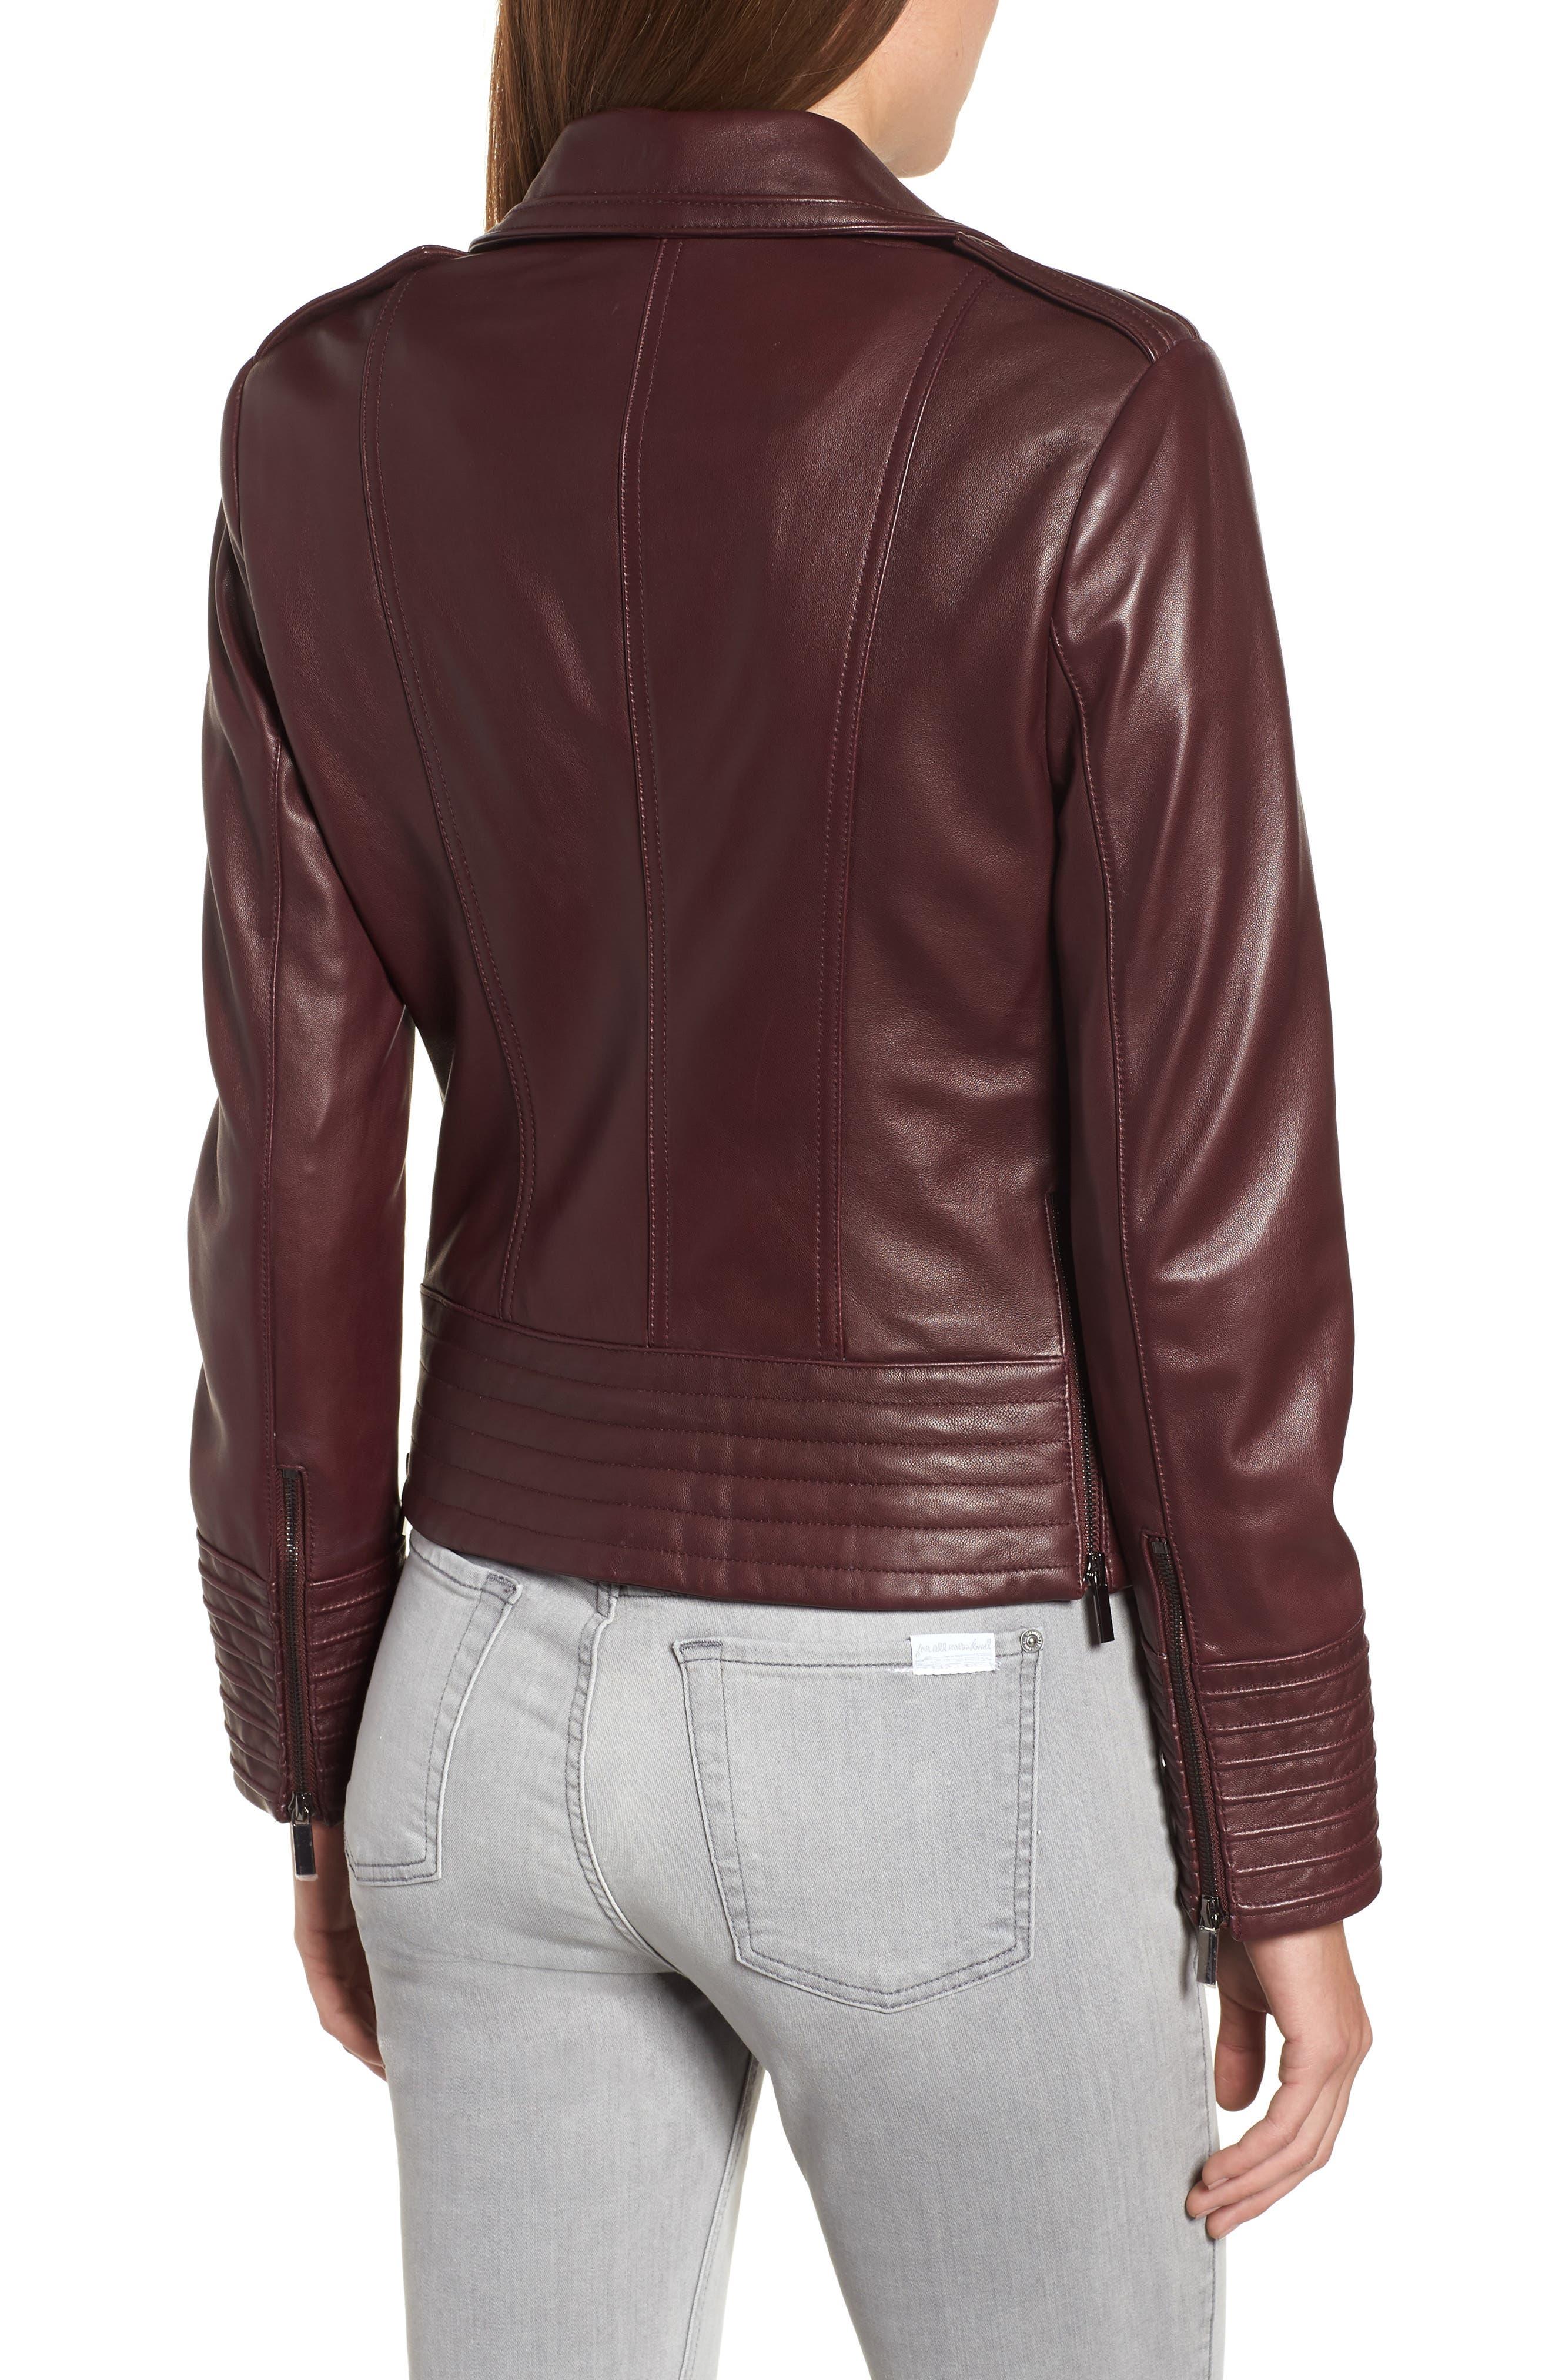 Gia Leather Biker Jacket,                             Alternate thumbnail 2, color,                             Burgundy